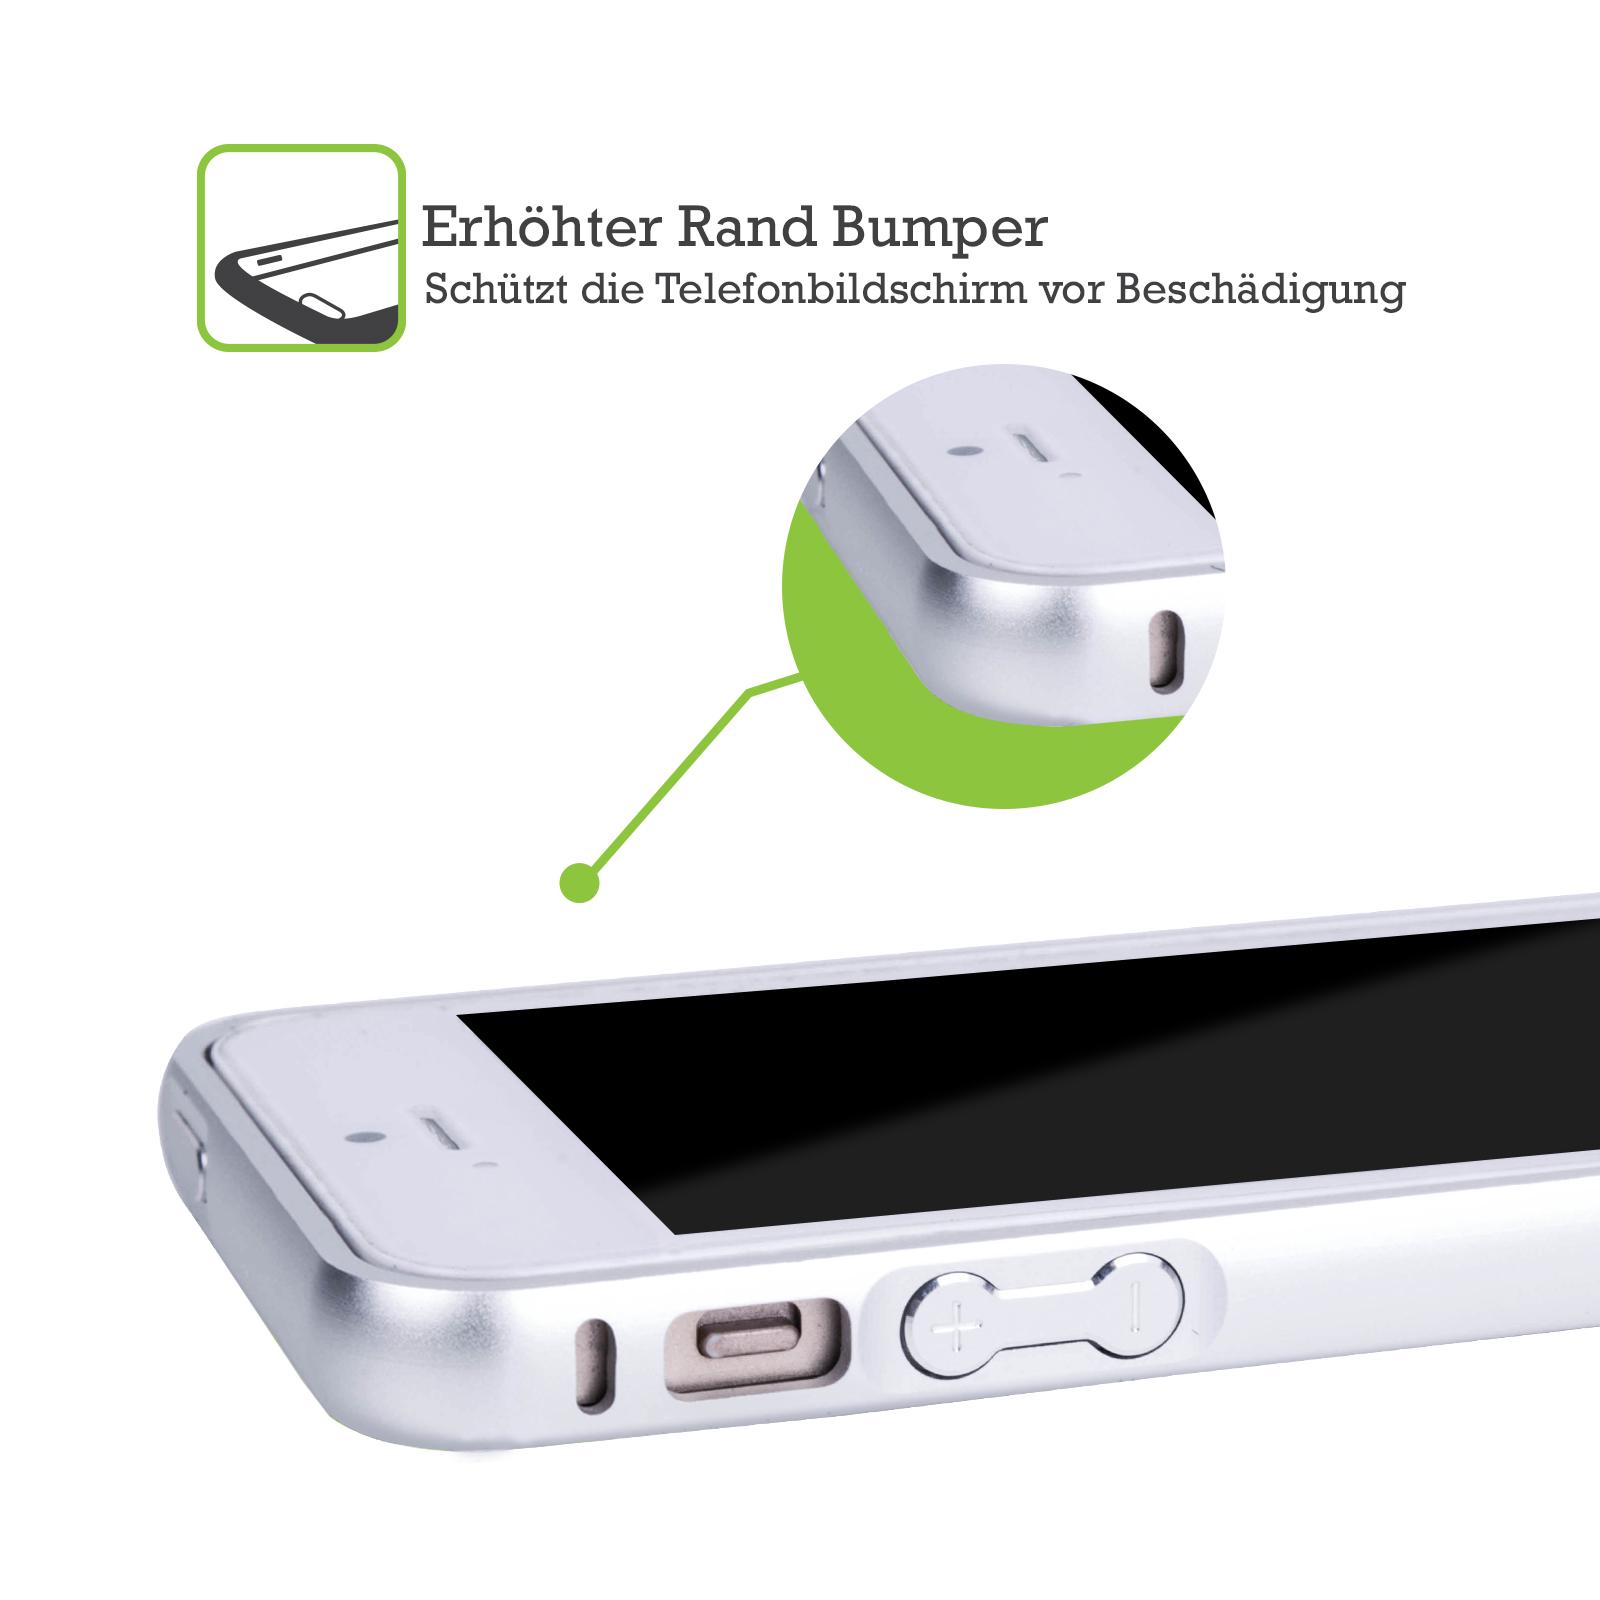 HEAD-CASE-DESIGNS-LIPPE-MUSTER-SILBER-RAHMEN-HULLE-FUR-APPLE-iPHONE-HANDYS